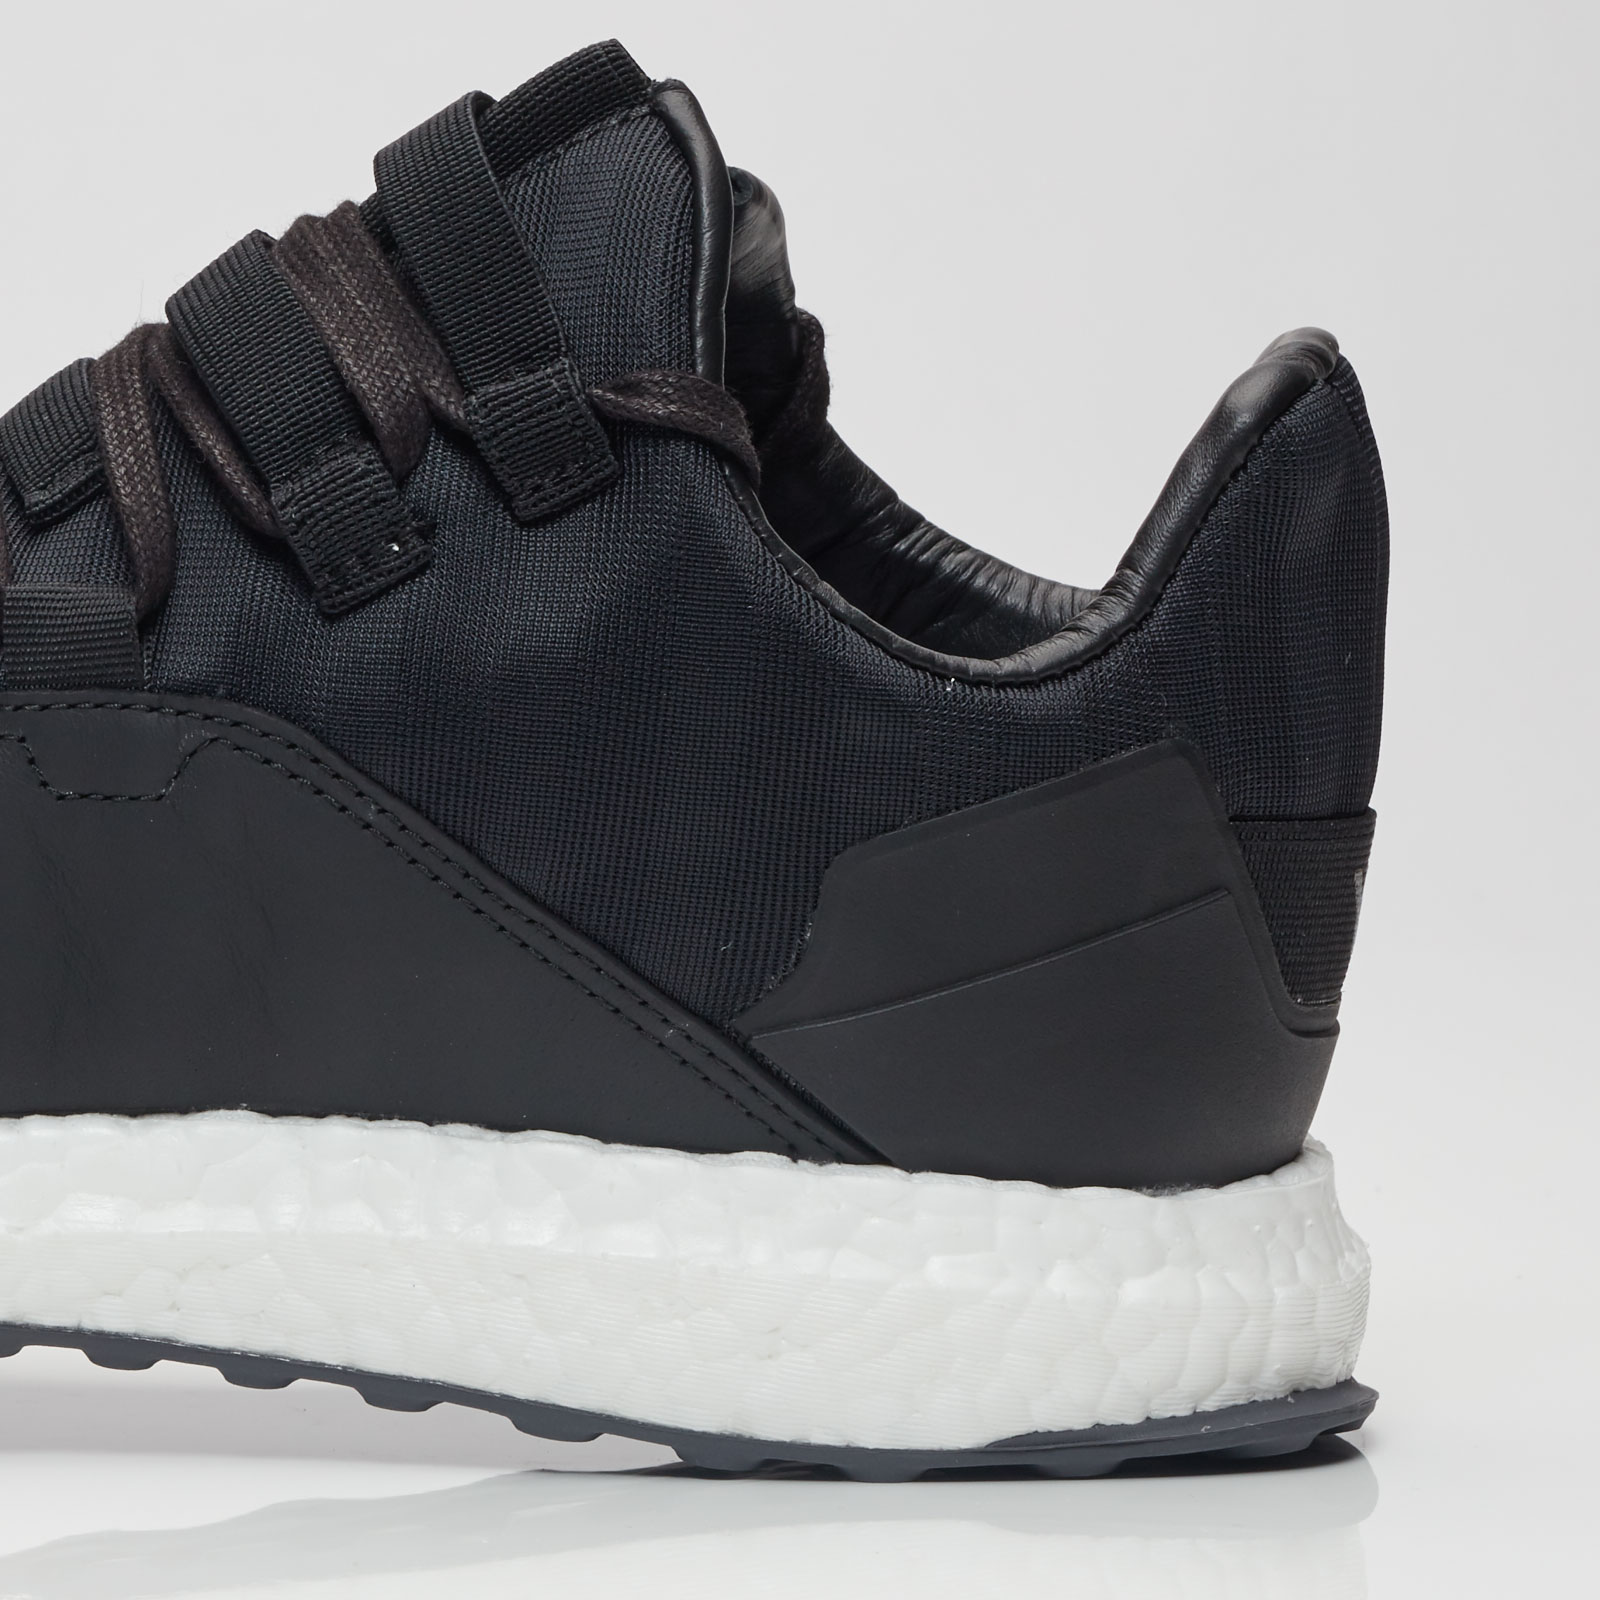 adidas Kozoko Low - By2632 - Sneakersnstuff  eab3d11e0e77